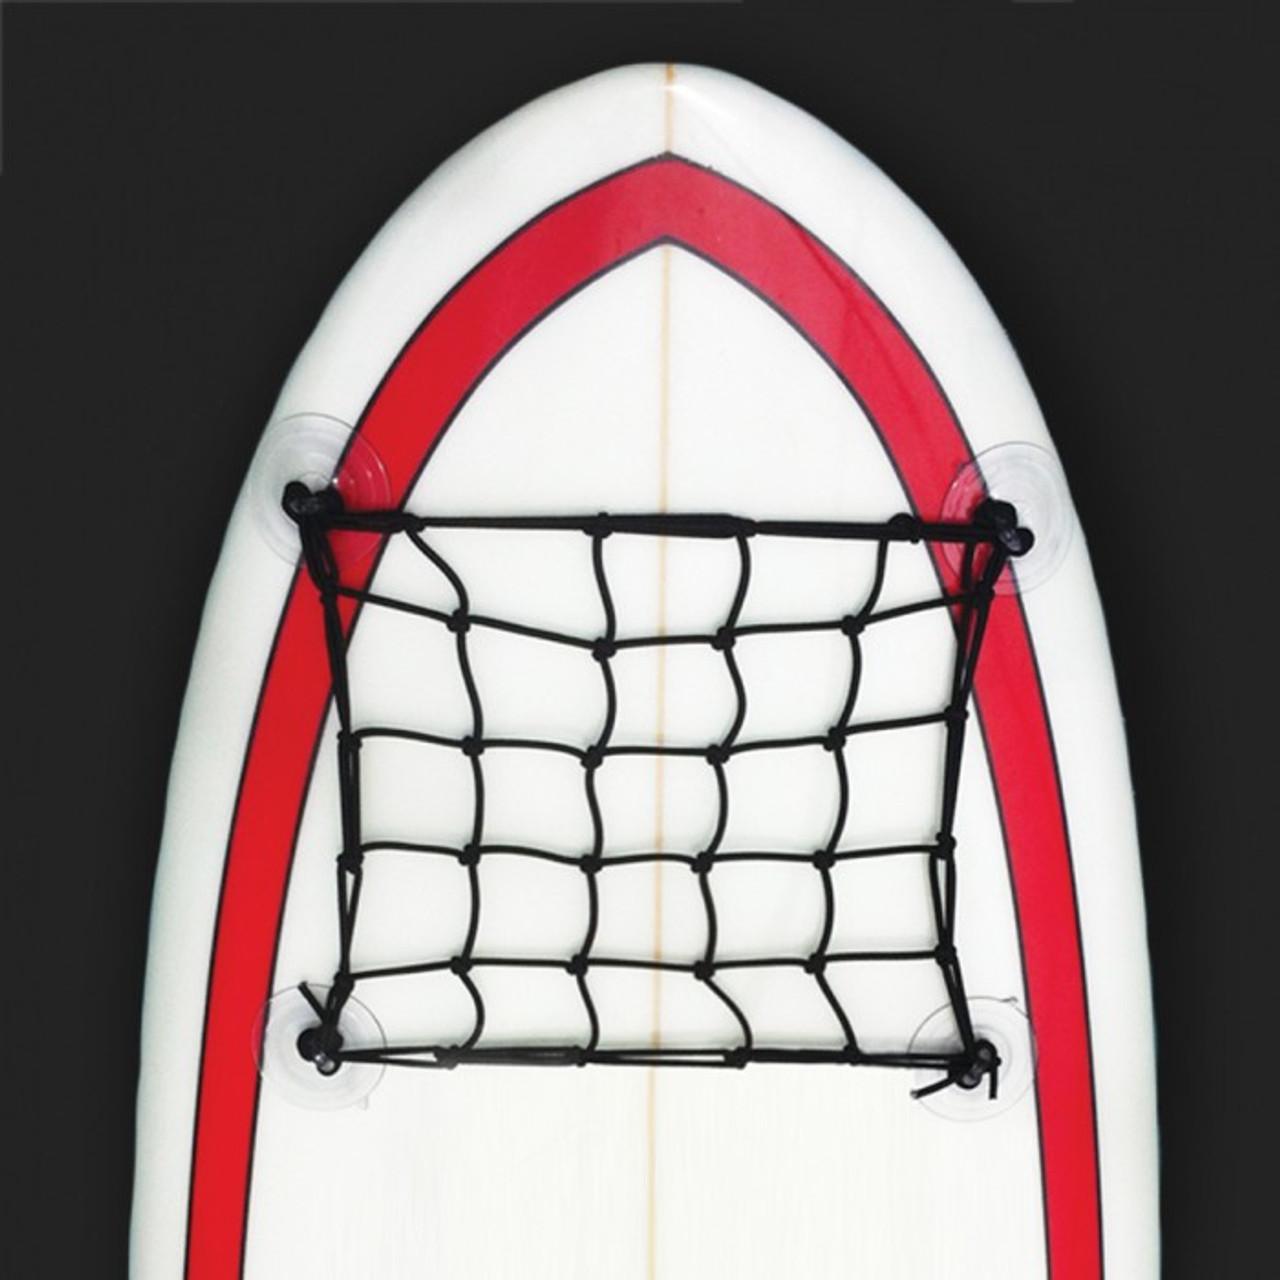 SUP deck bungee net